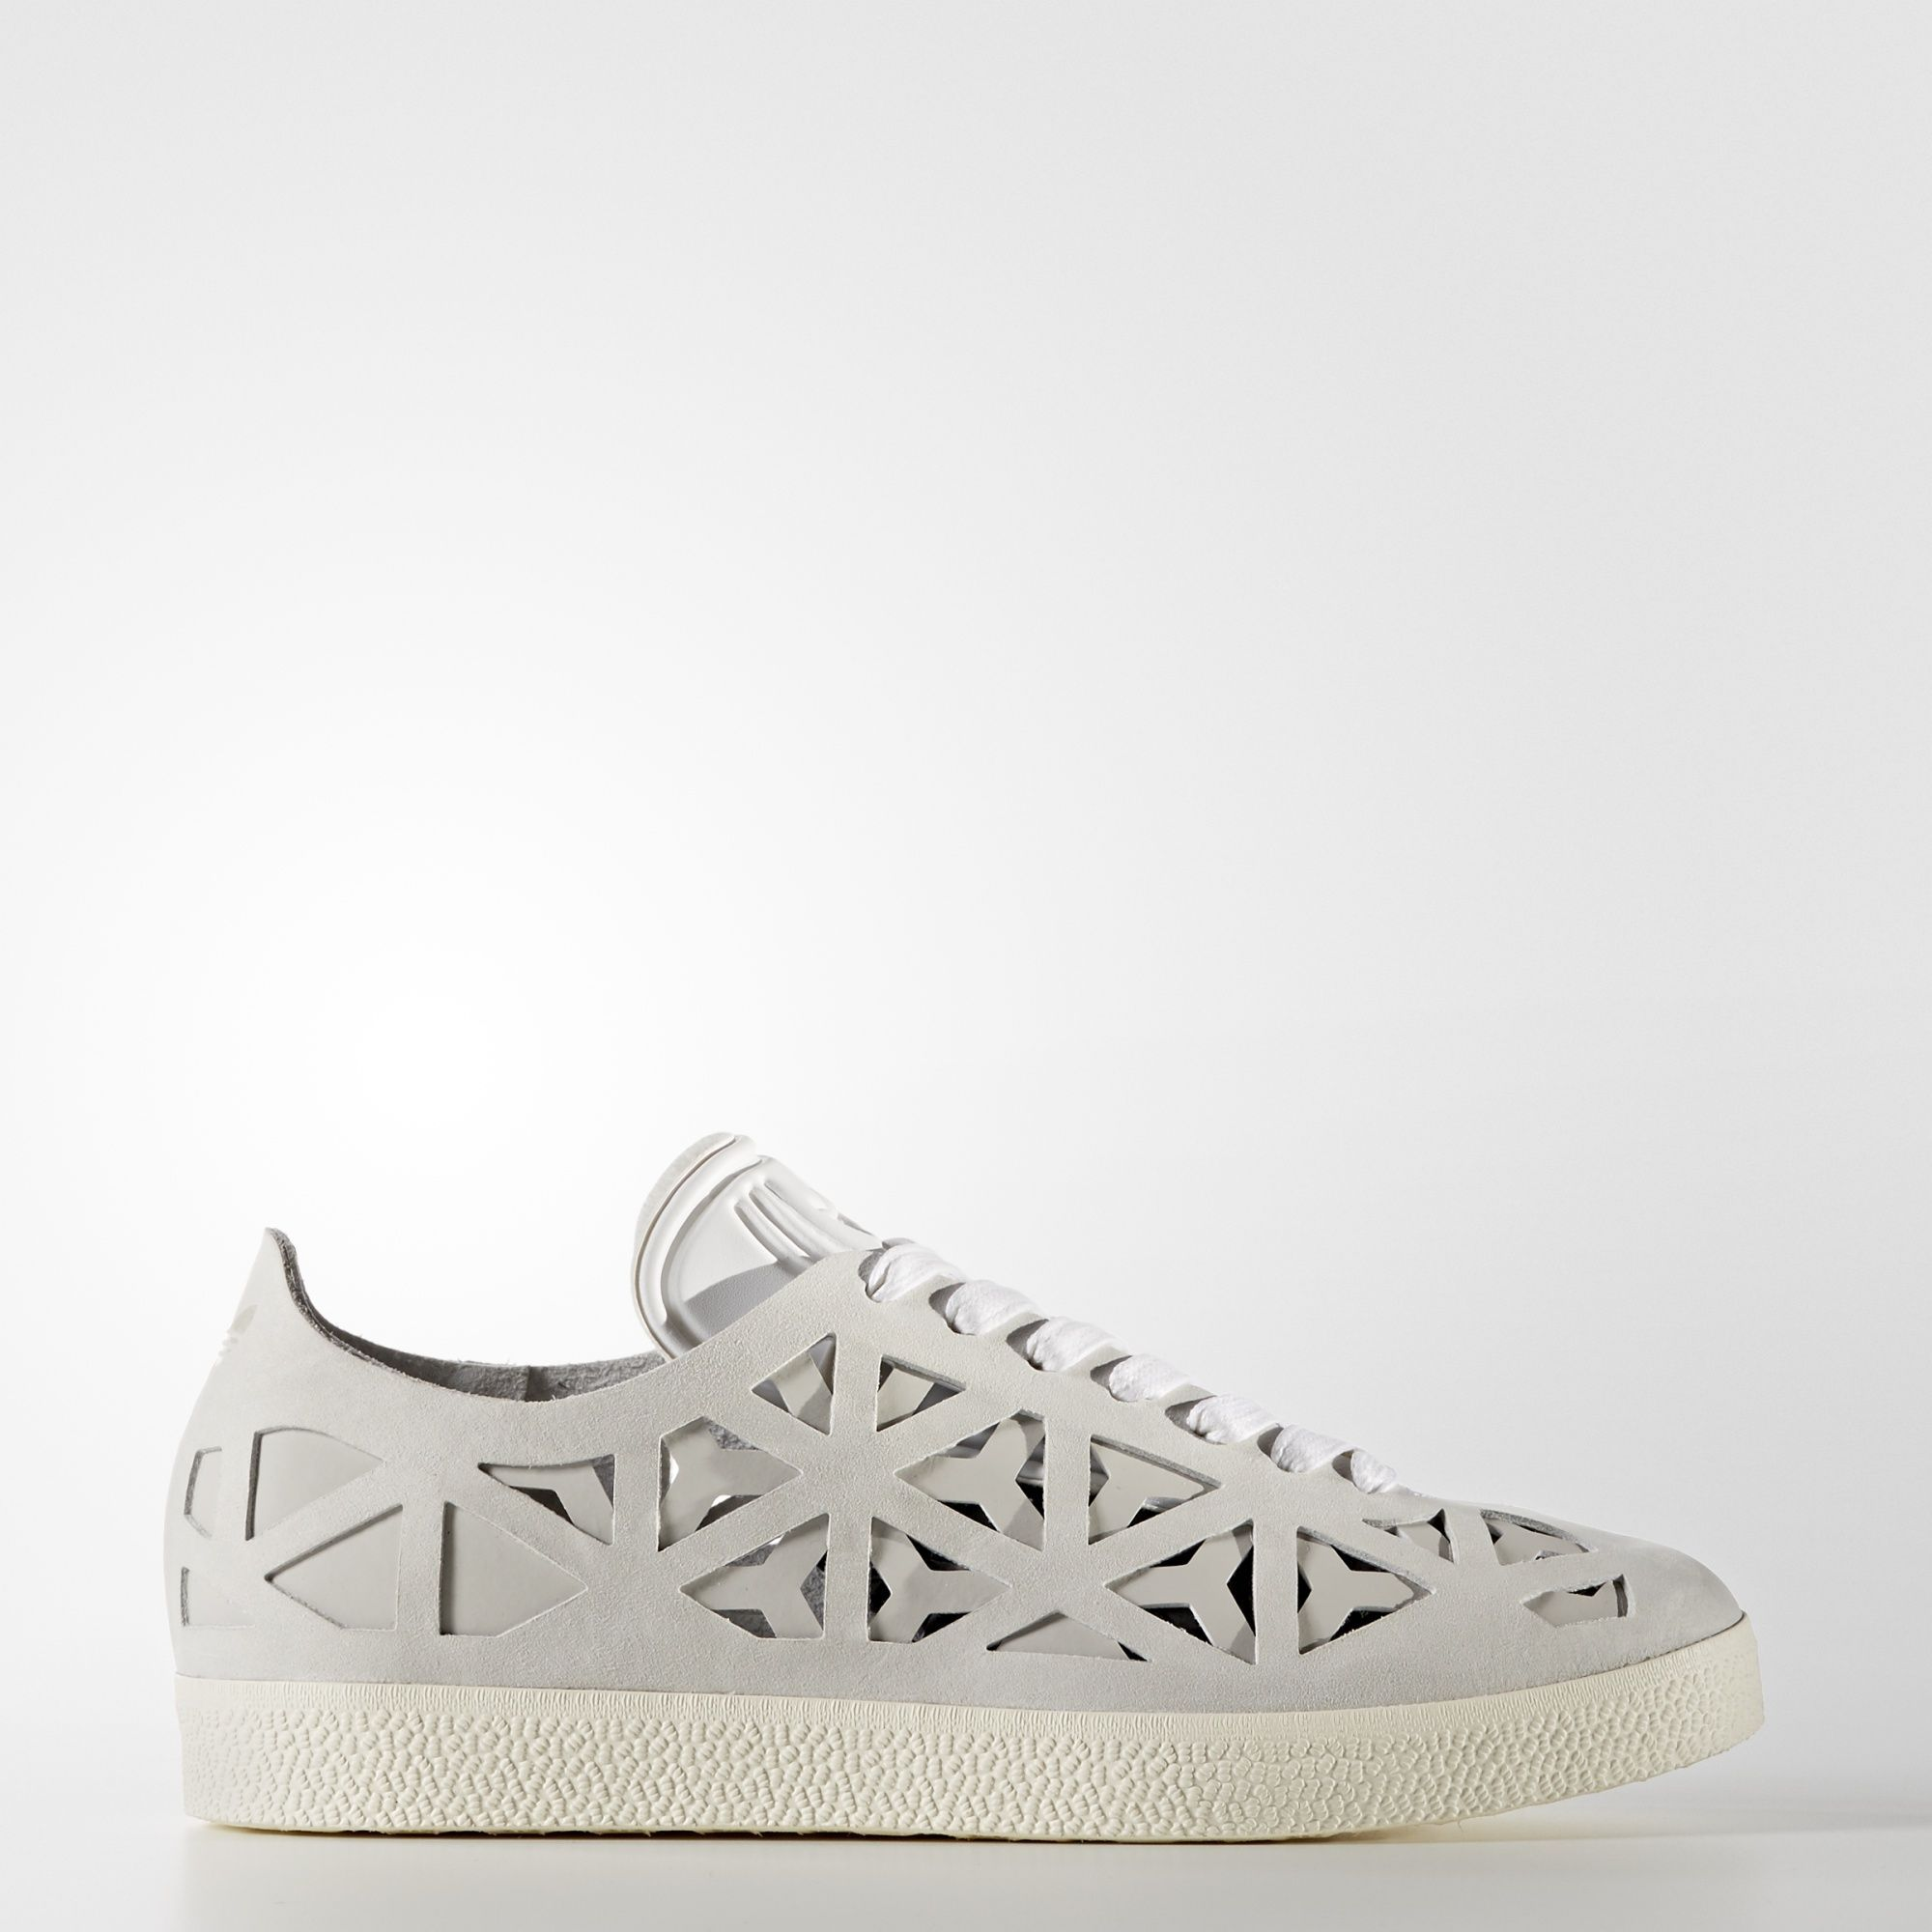 adidas - Gazelle Cutout Shoes